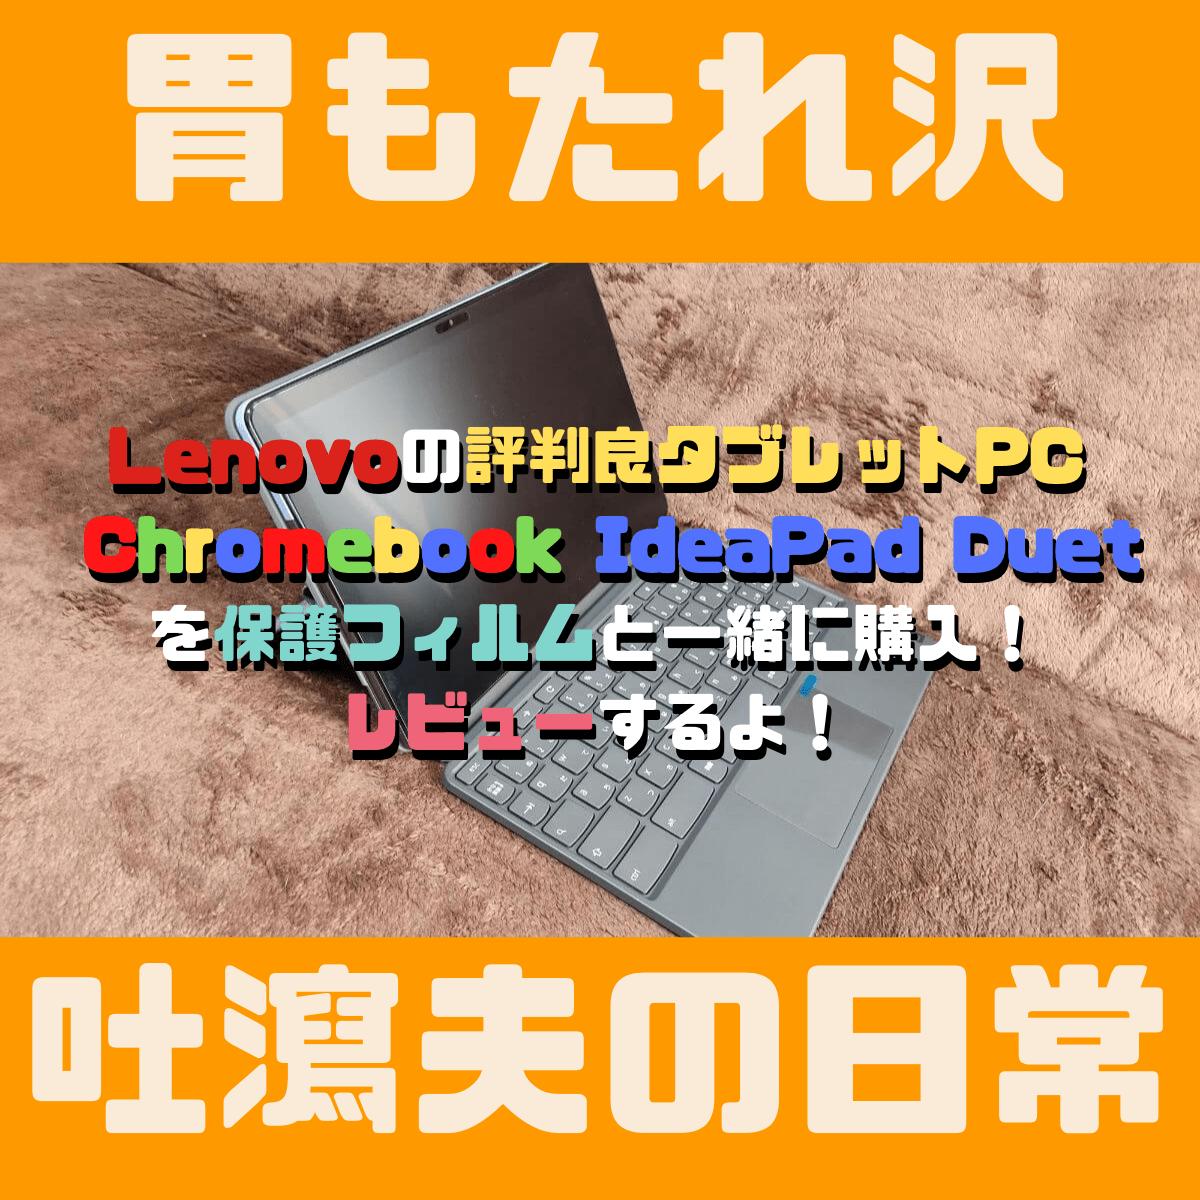 enovoの評判良タブレットPC Chromebook IdeaPad Duetを保護フィルムと一緒に購入!レビューするよ!